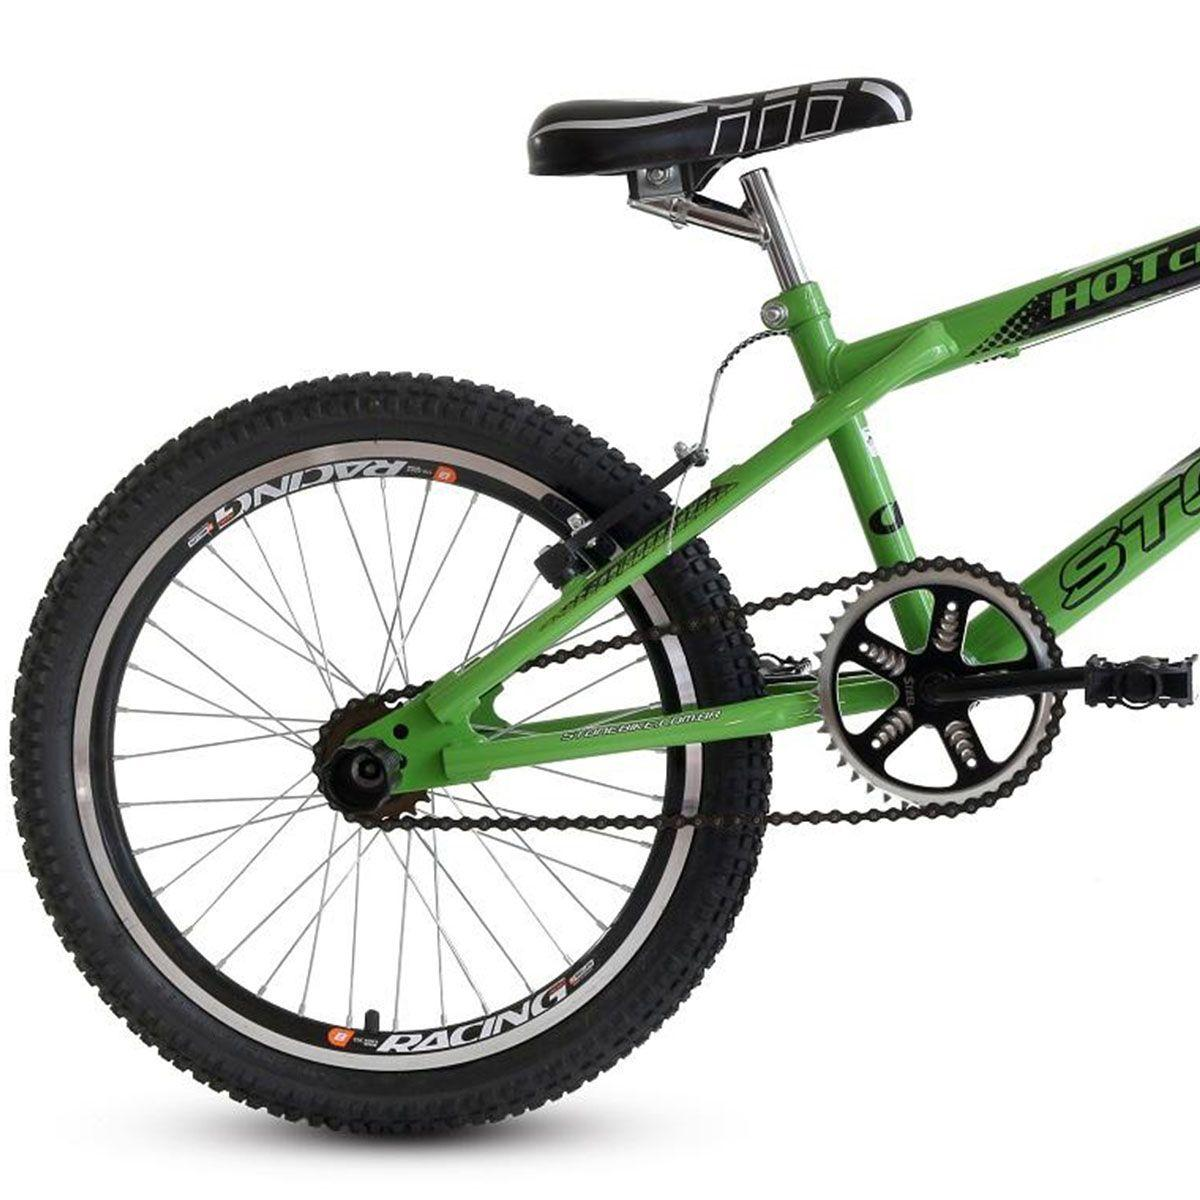 c56919ad5 Bicicleta Infantil Masculina Hot Cross Aro Aero 20 Stone Bike - Stone bikes  R  588